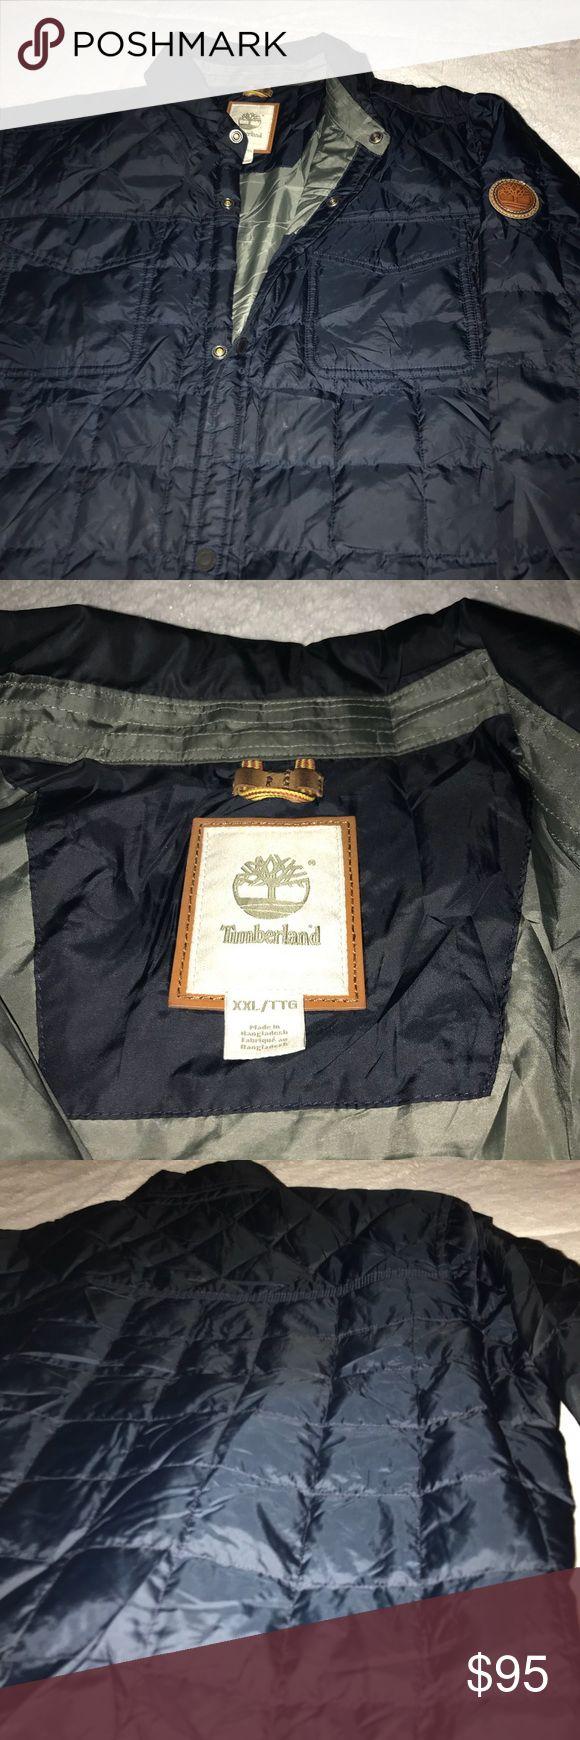 Men's Navy Timberland Jacket Navy Blue Perfect condition 100% polyester 7 pockets 3 inside pockets Timberland Jackets & Coats